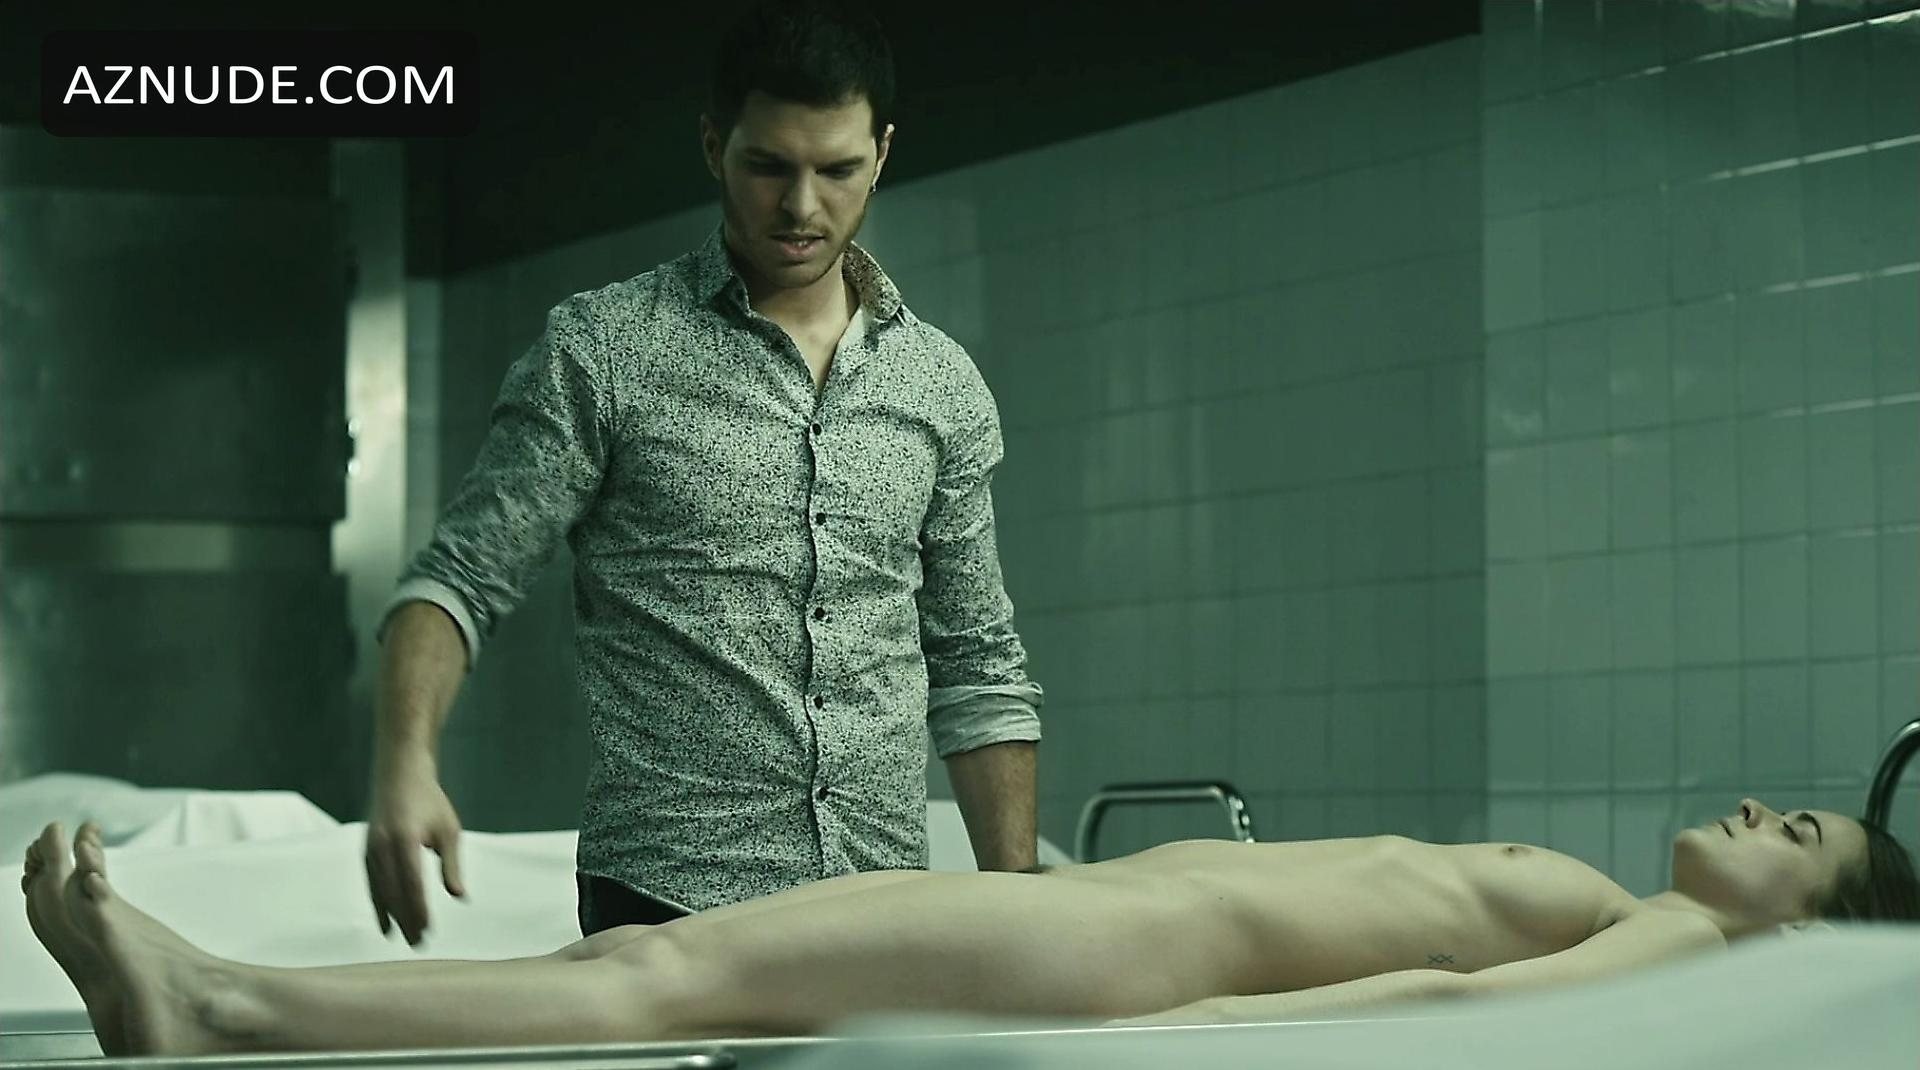 Alba ribas nude sex scene in diario de una ninfomana movie 6